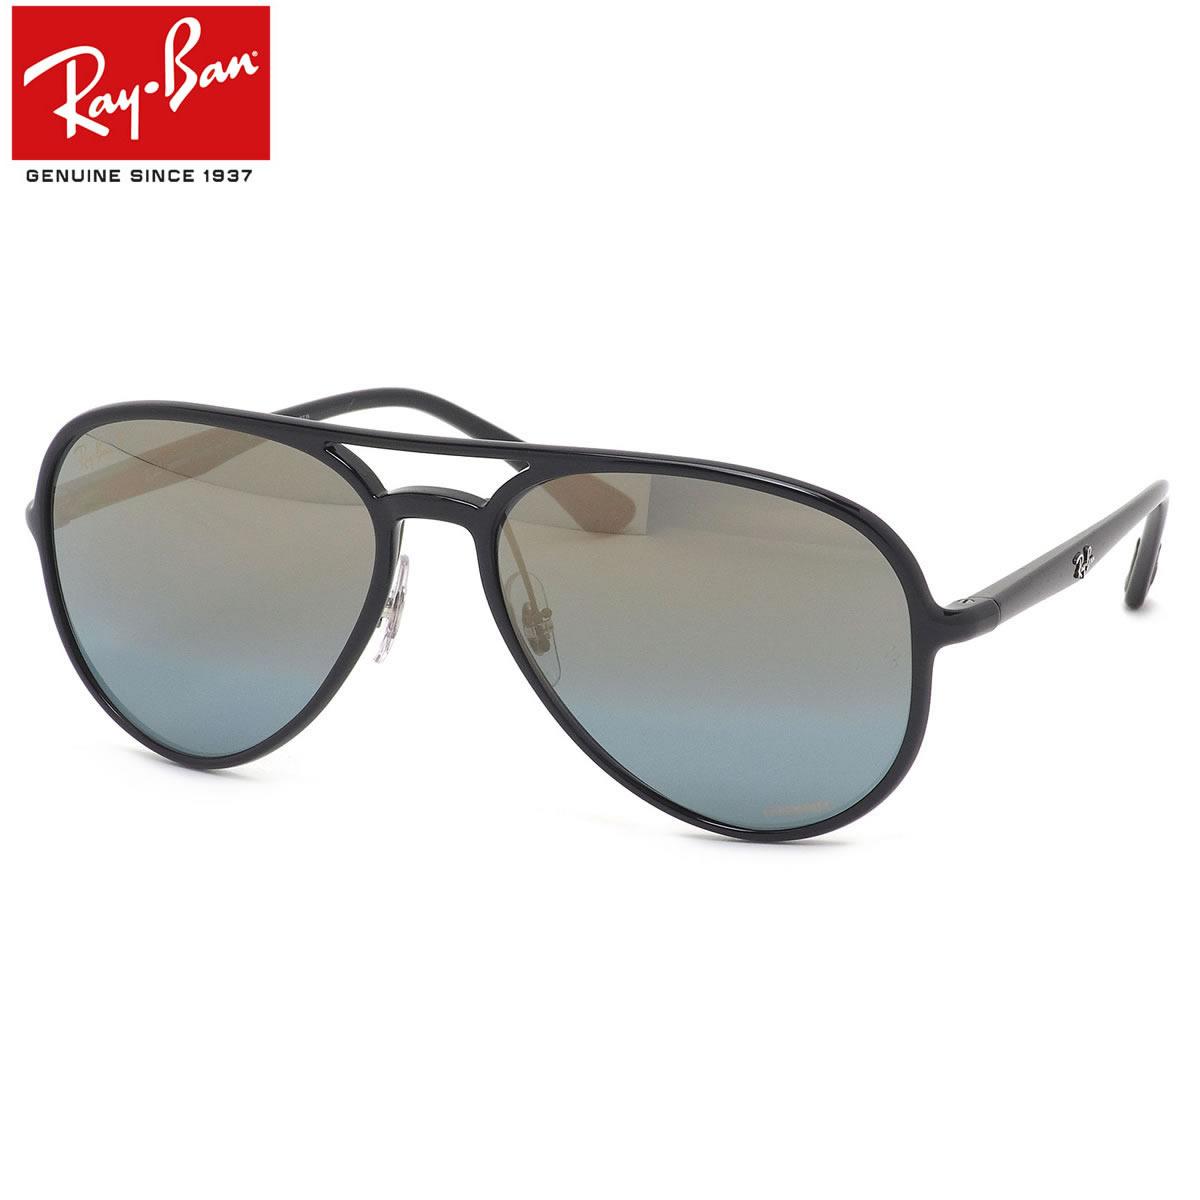 Ray-Ban レイバン サングラス RB4320CH 601/J0 58サイズ CHROMANCE クロマンス ティアドロップ 偏光レンズ 偏光サングラス メンズ レディース